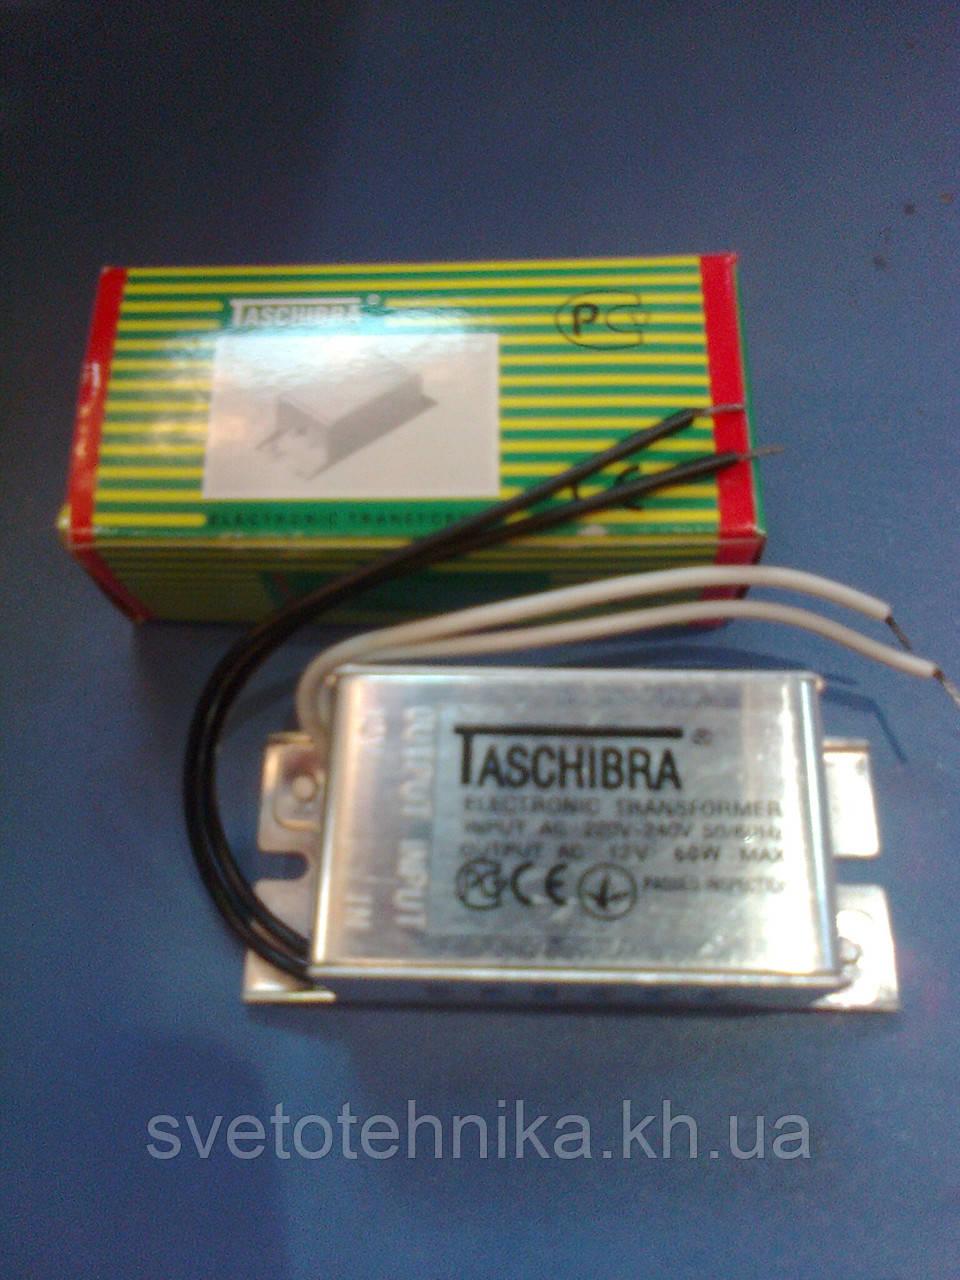 Трансформатор понижающий для галогенных ламп 12V Feron 60W / TRA 25 (TASHIBRA)